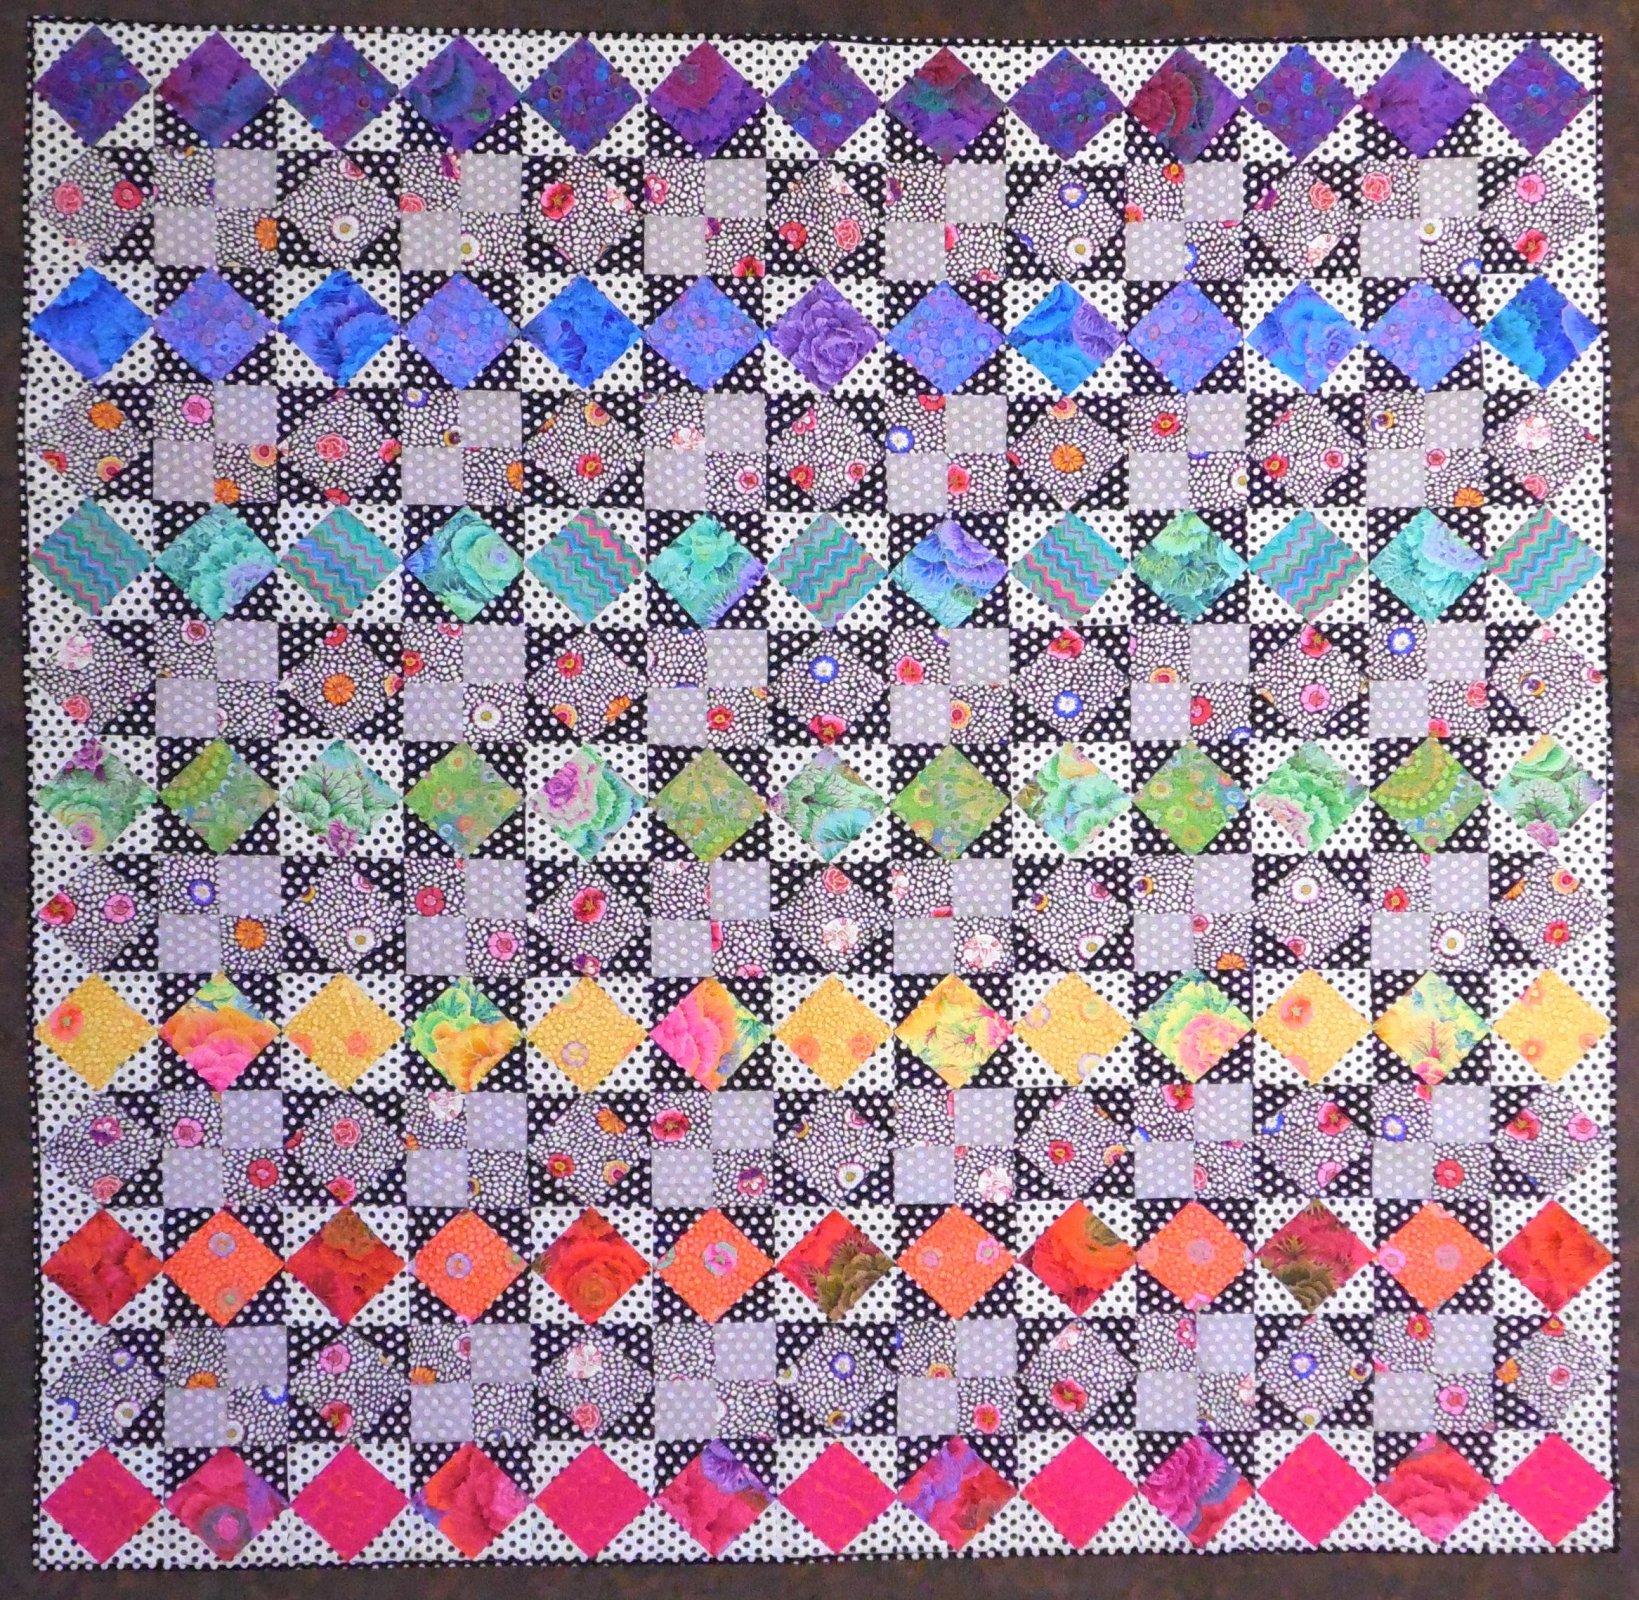 Kaffe Fassett - Rainbow Star Quilt Kit - 78 x 78 - Round 2